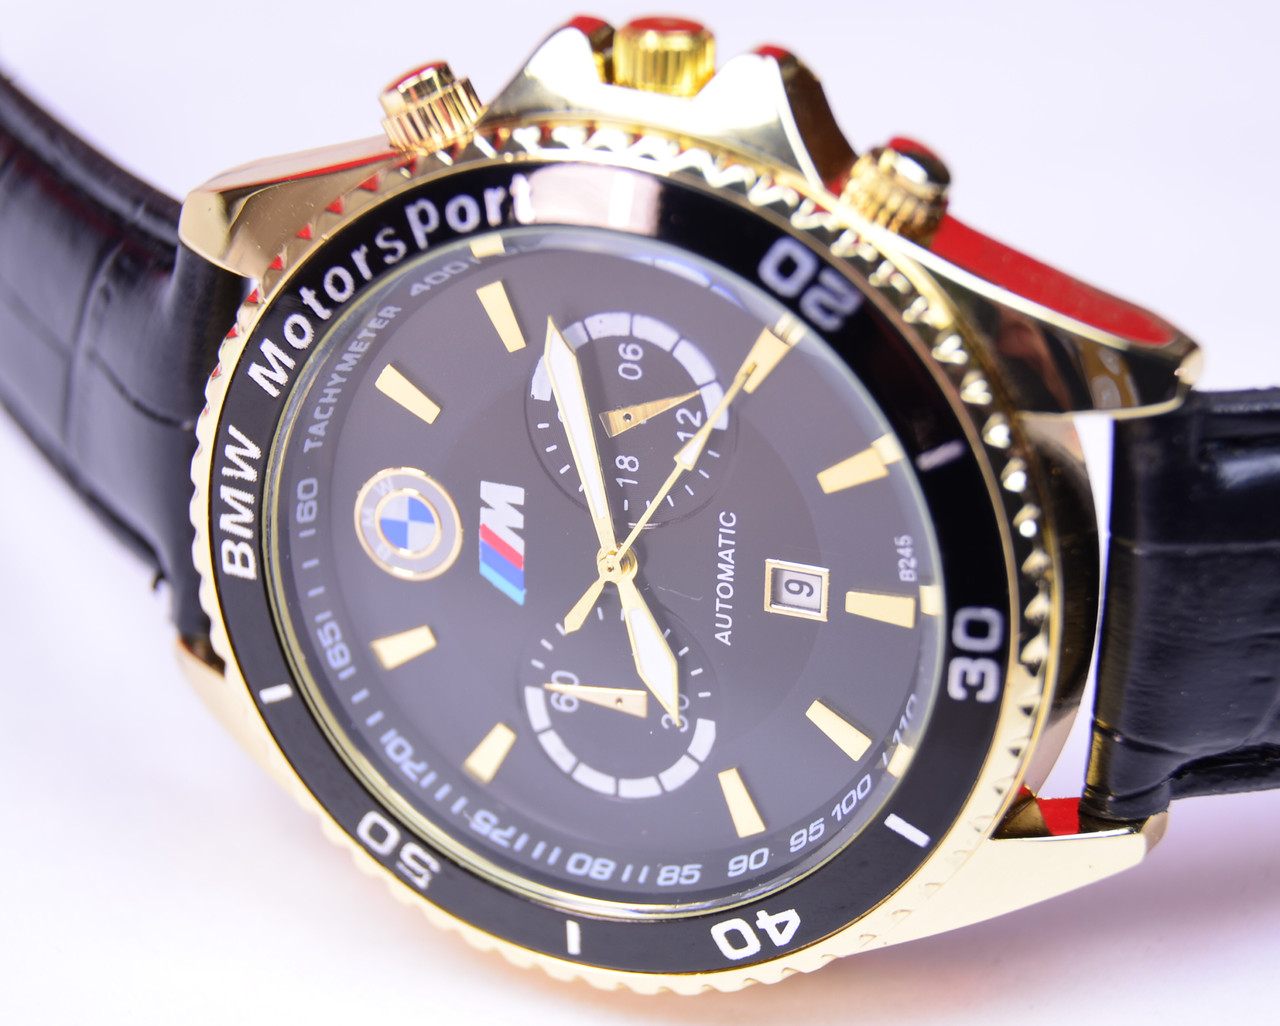 8d3ff5f7 Мужские наручные часы BMW (B243) кварц календарь, цена 219 грн., купить в  Николаеве — Prom.ua (ID#514697840)